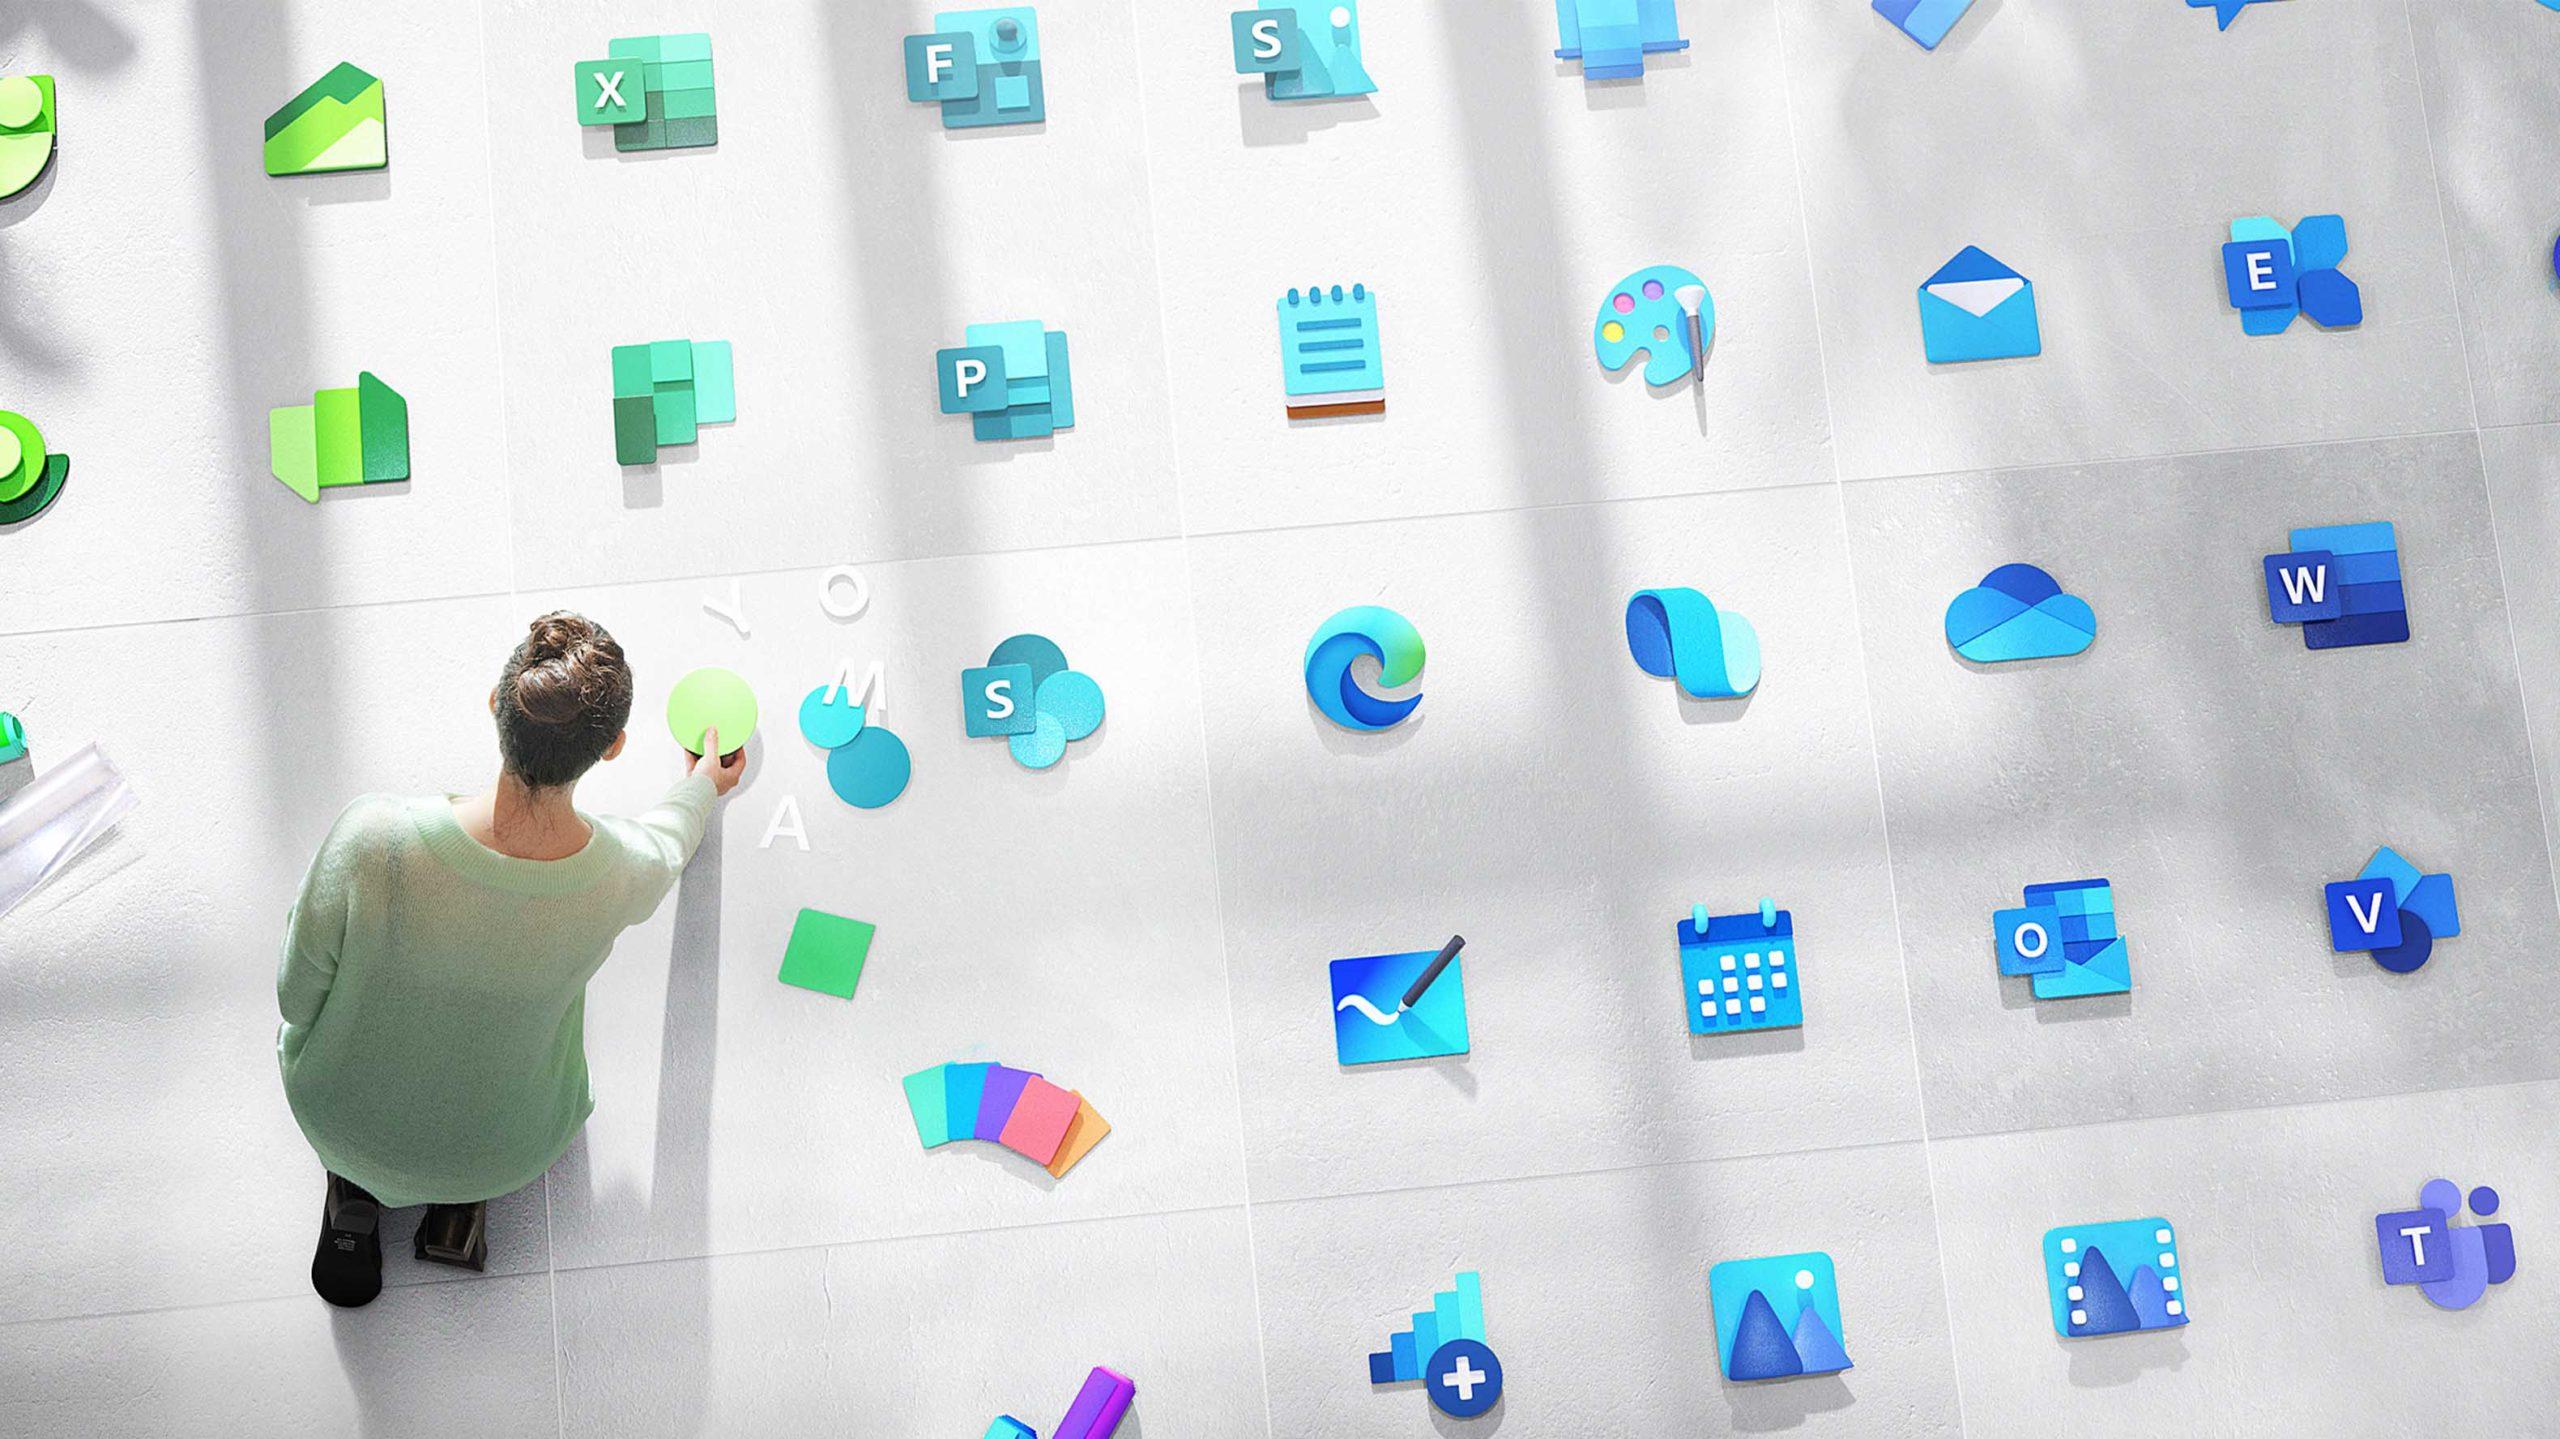 Microsoft Windows new icons